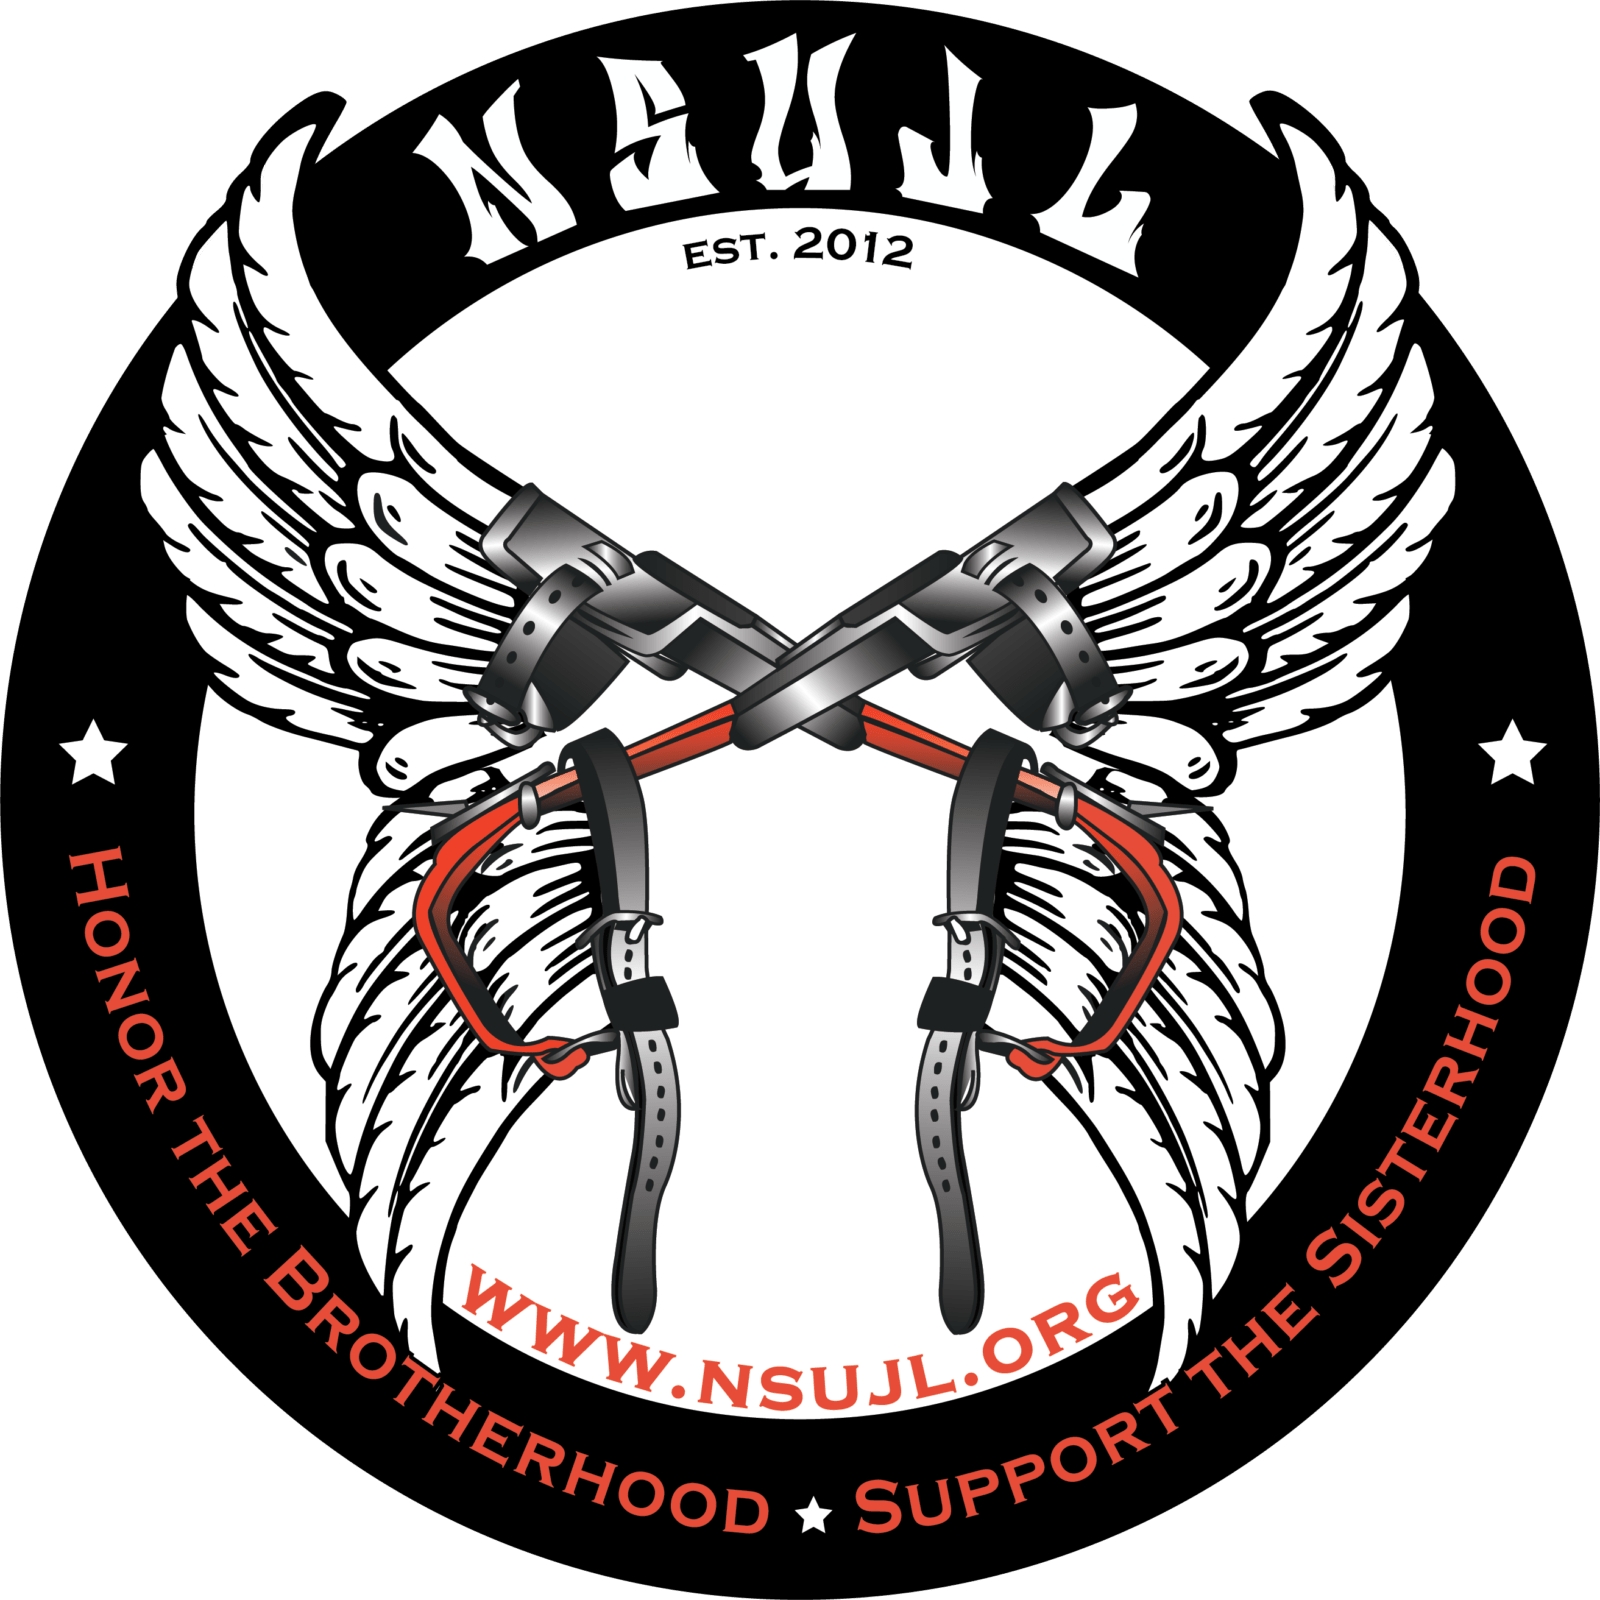 NSUJL logo hard hat stickers